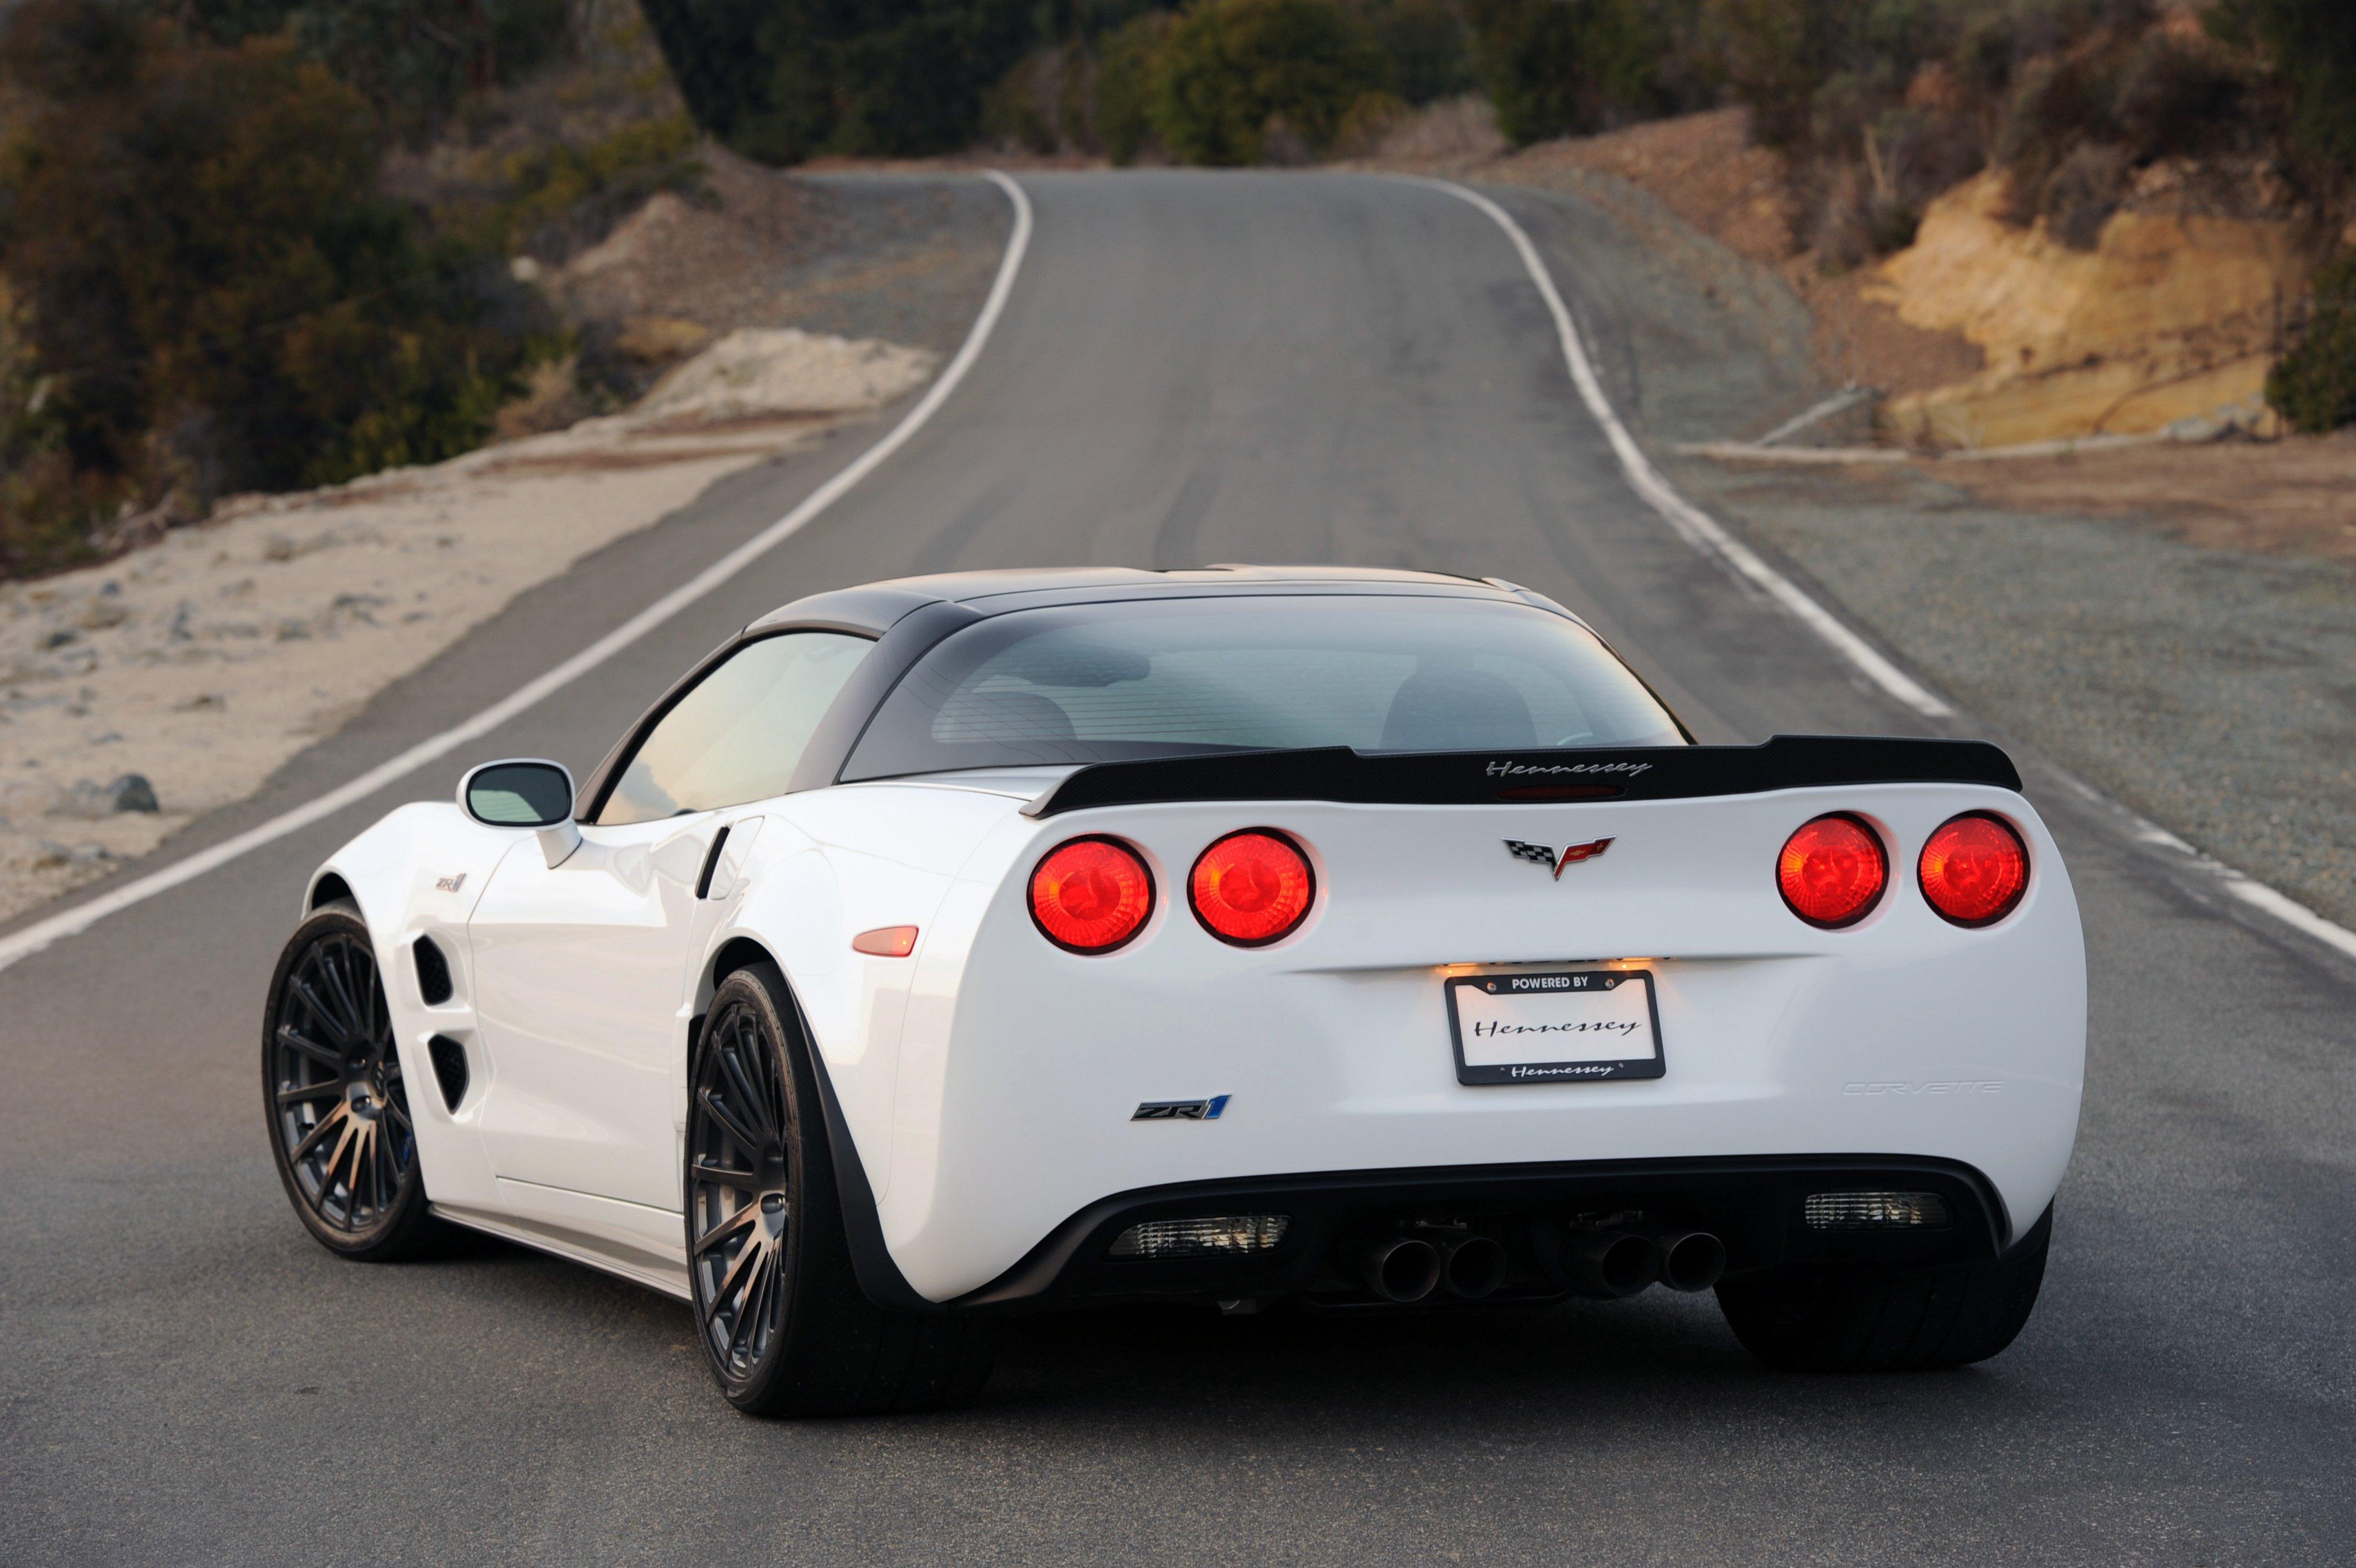 2012 Hennessey Chevrolet Corvette ZR1 ZR750 C 6 Muscle Supercar Wallpaper